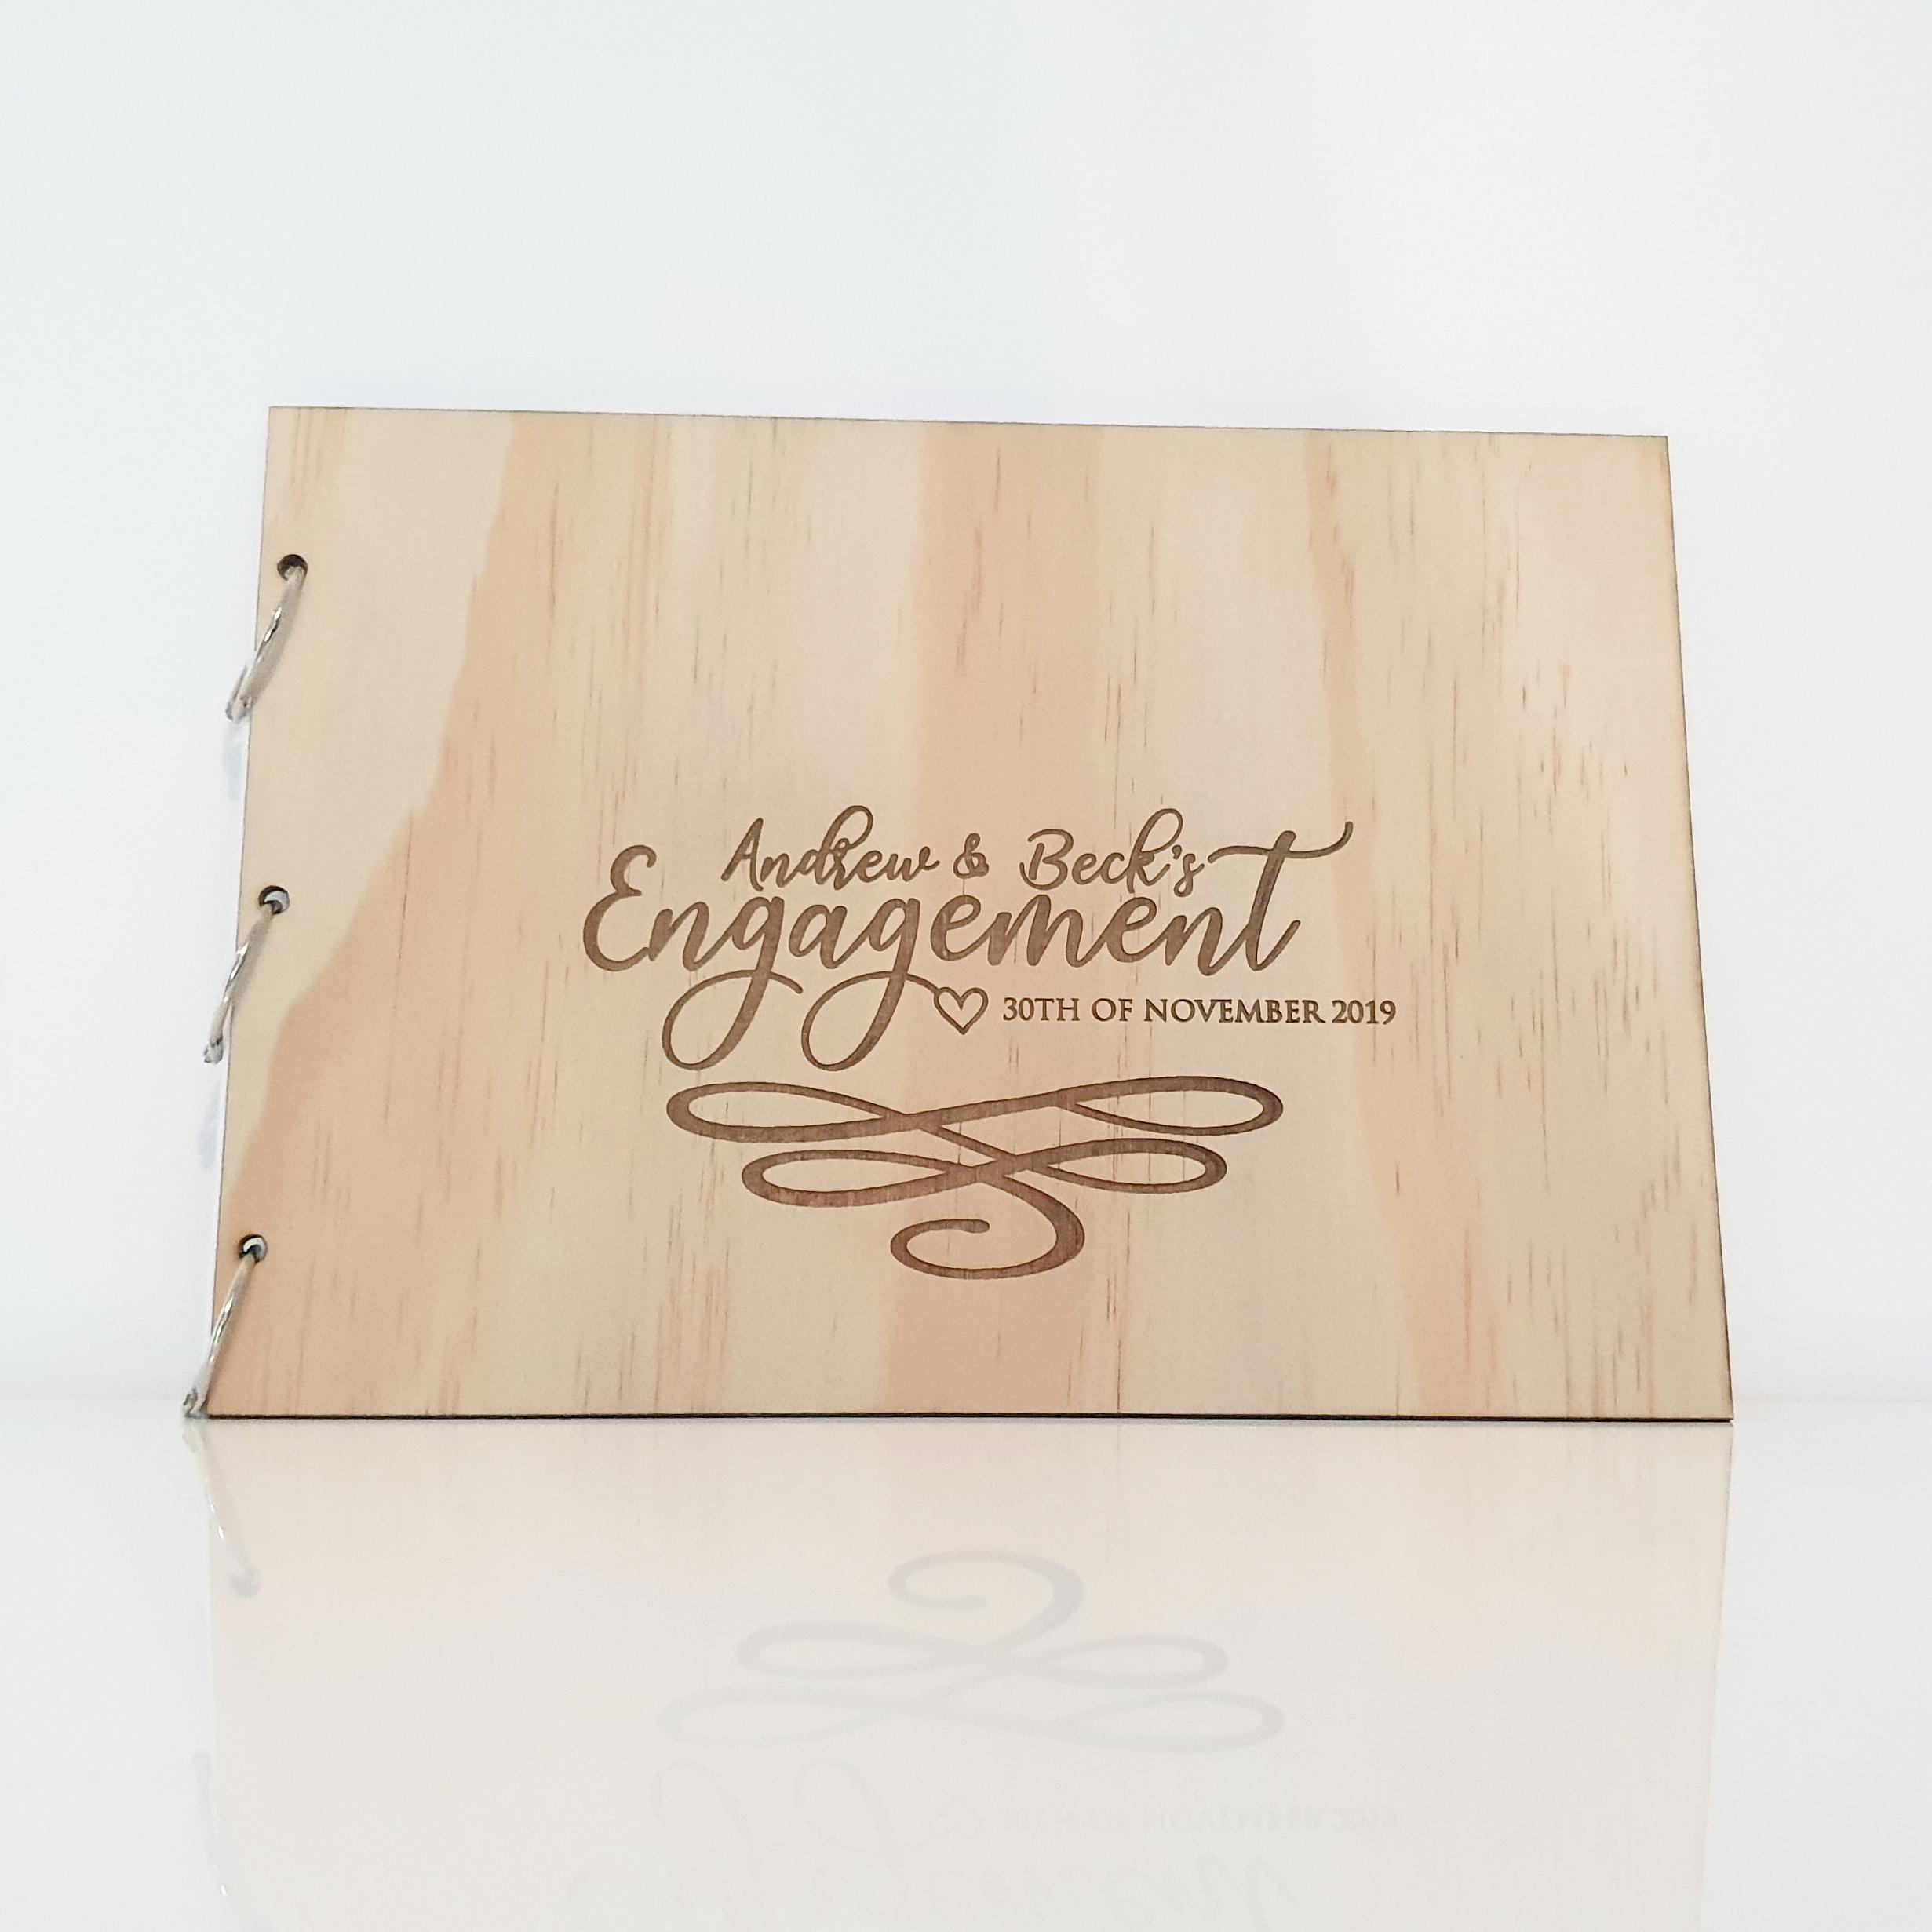 Wooden Laser Engraved Guest Book